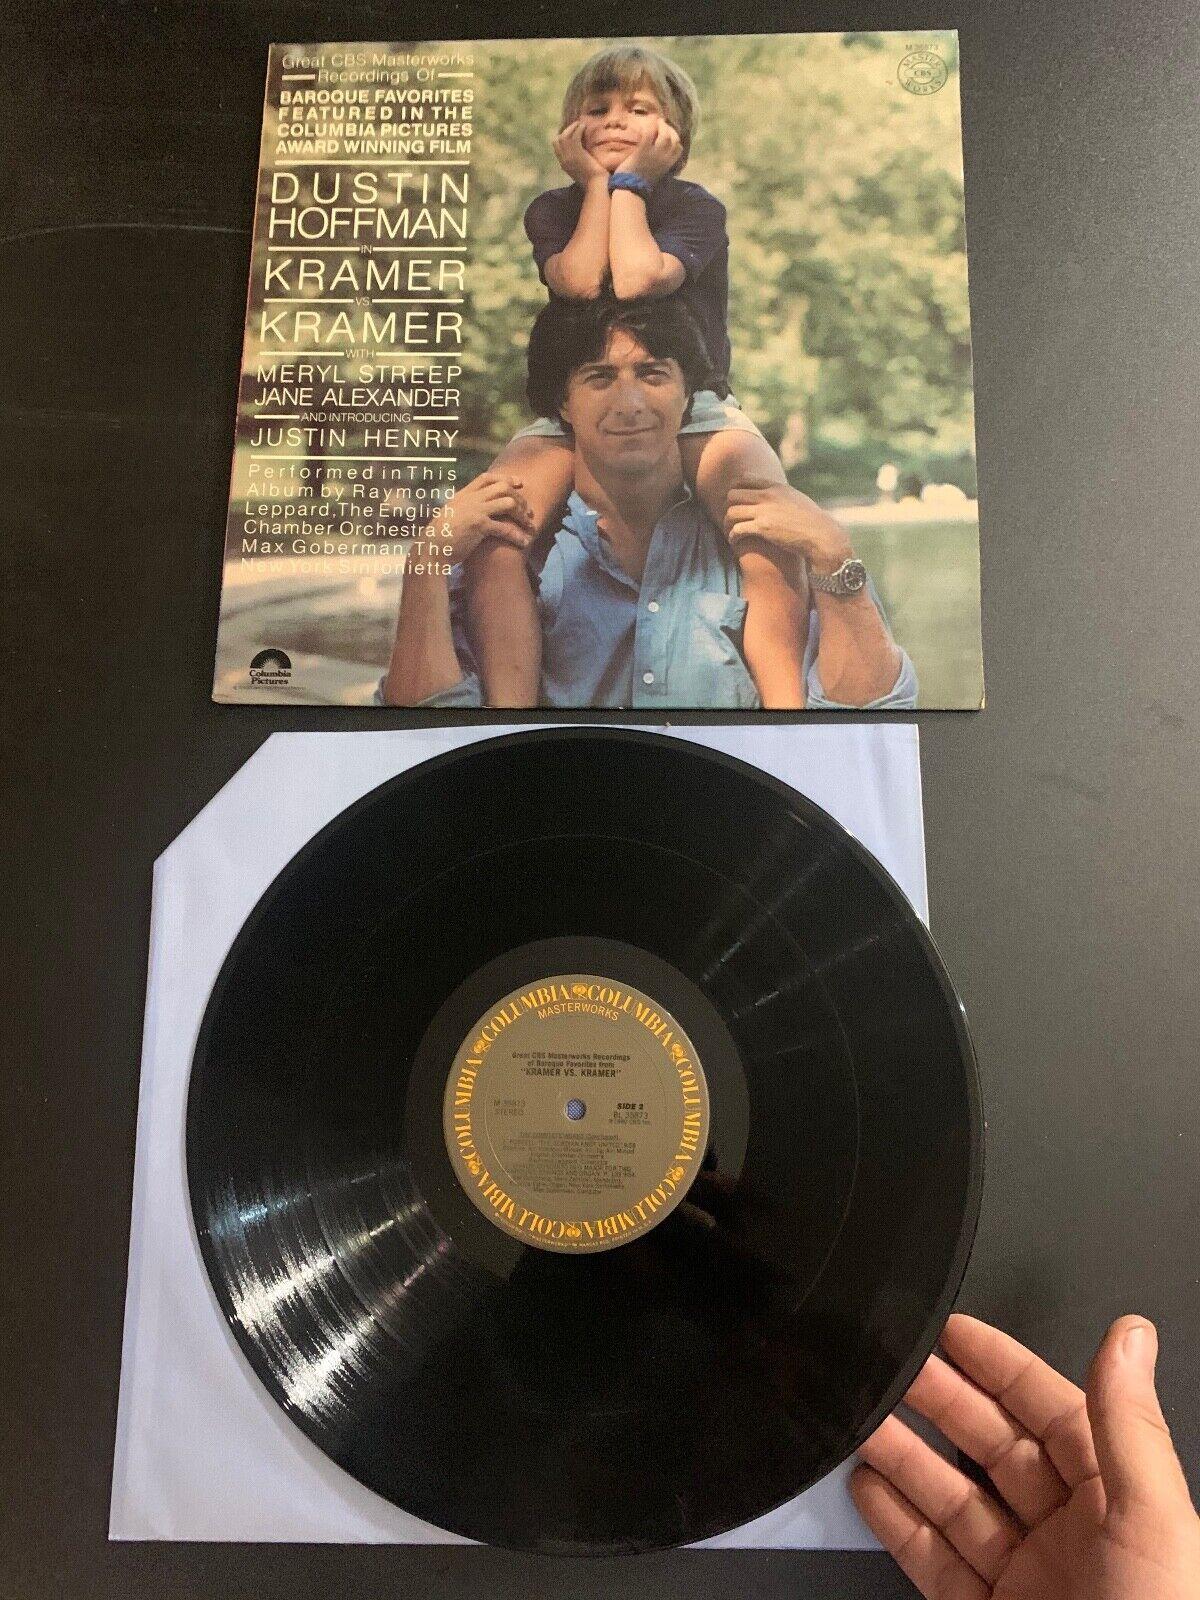 LP RECORD - KRAMER VS KRAMER SOUNDTRACK - CBS RECORDS - $9.99